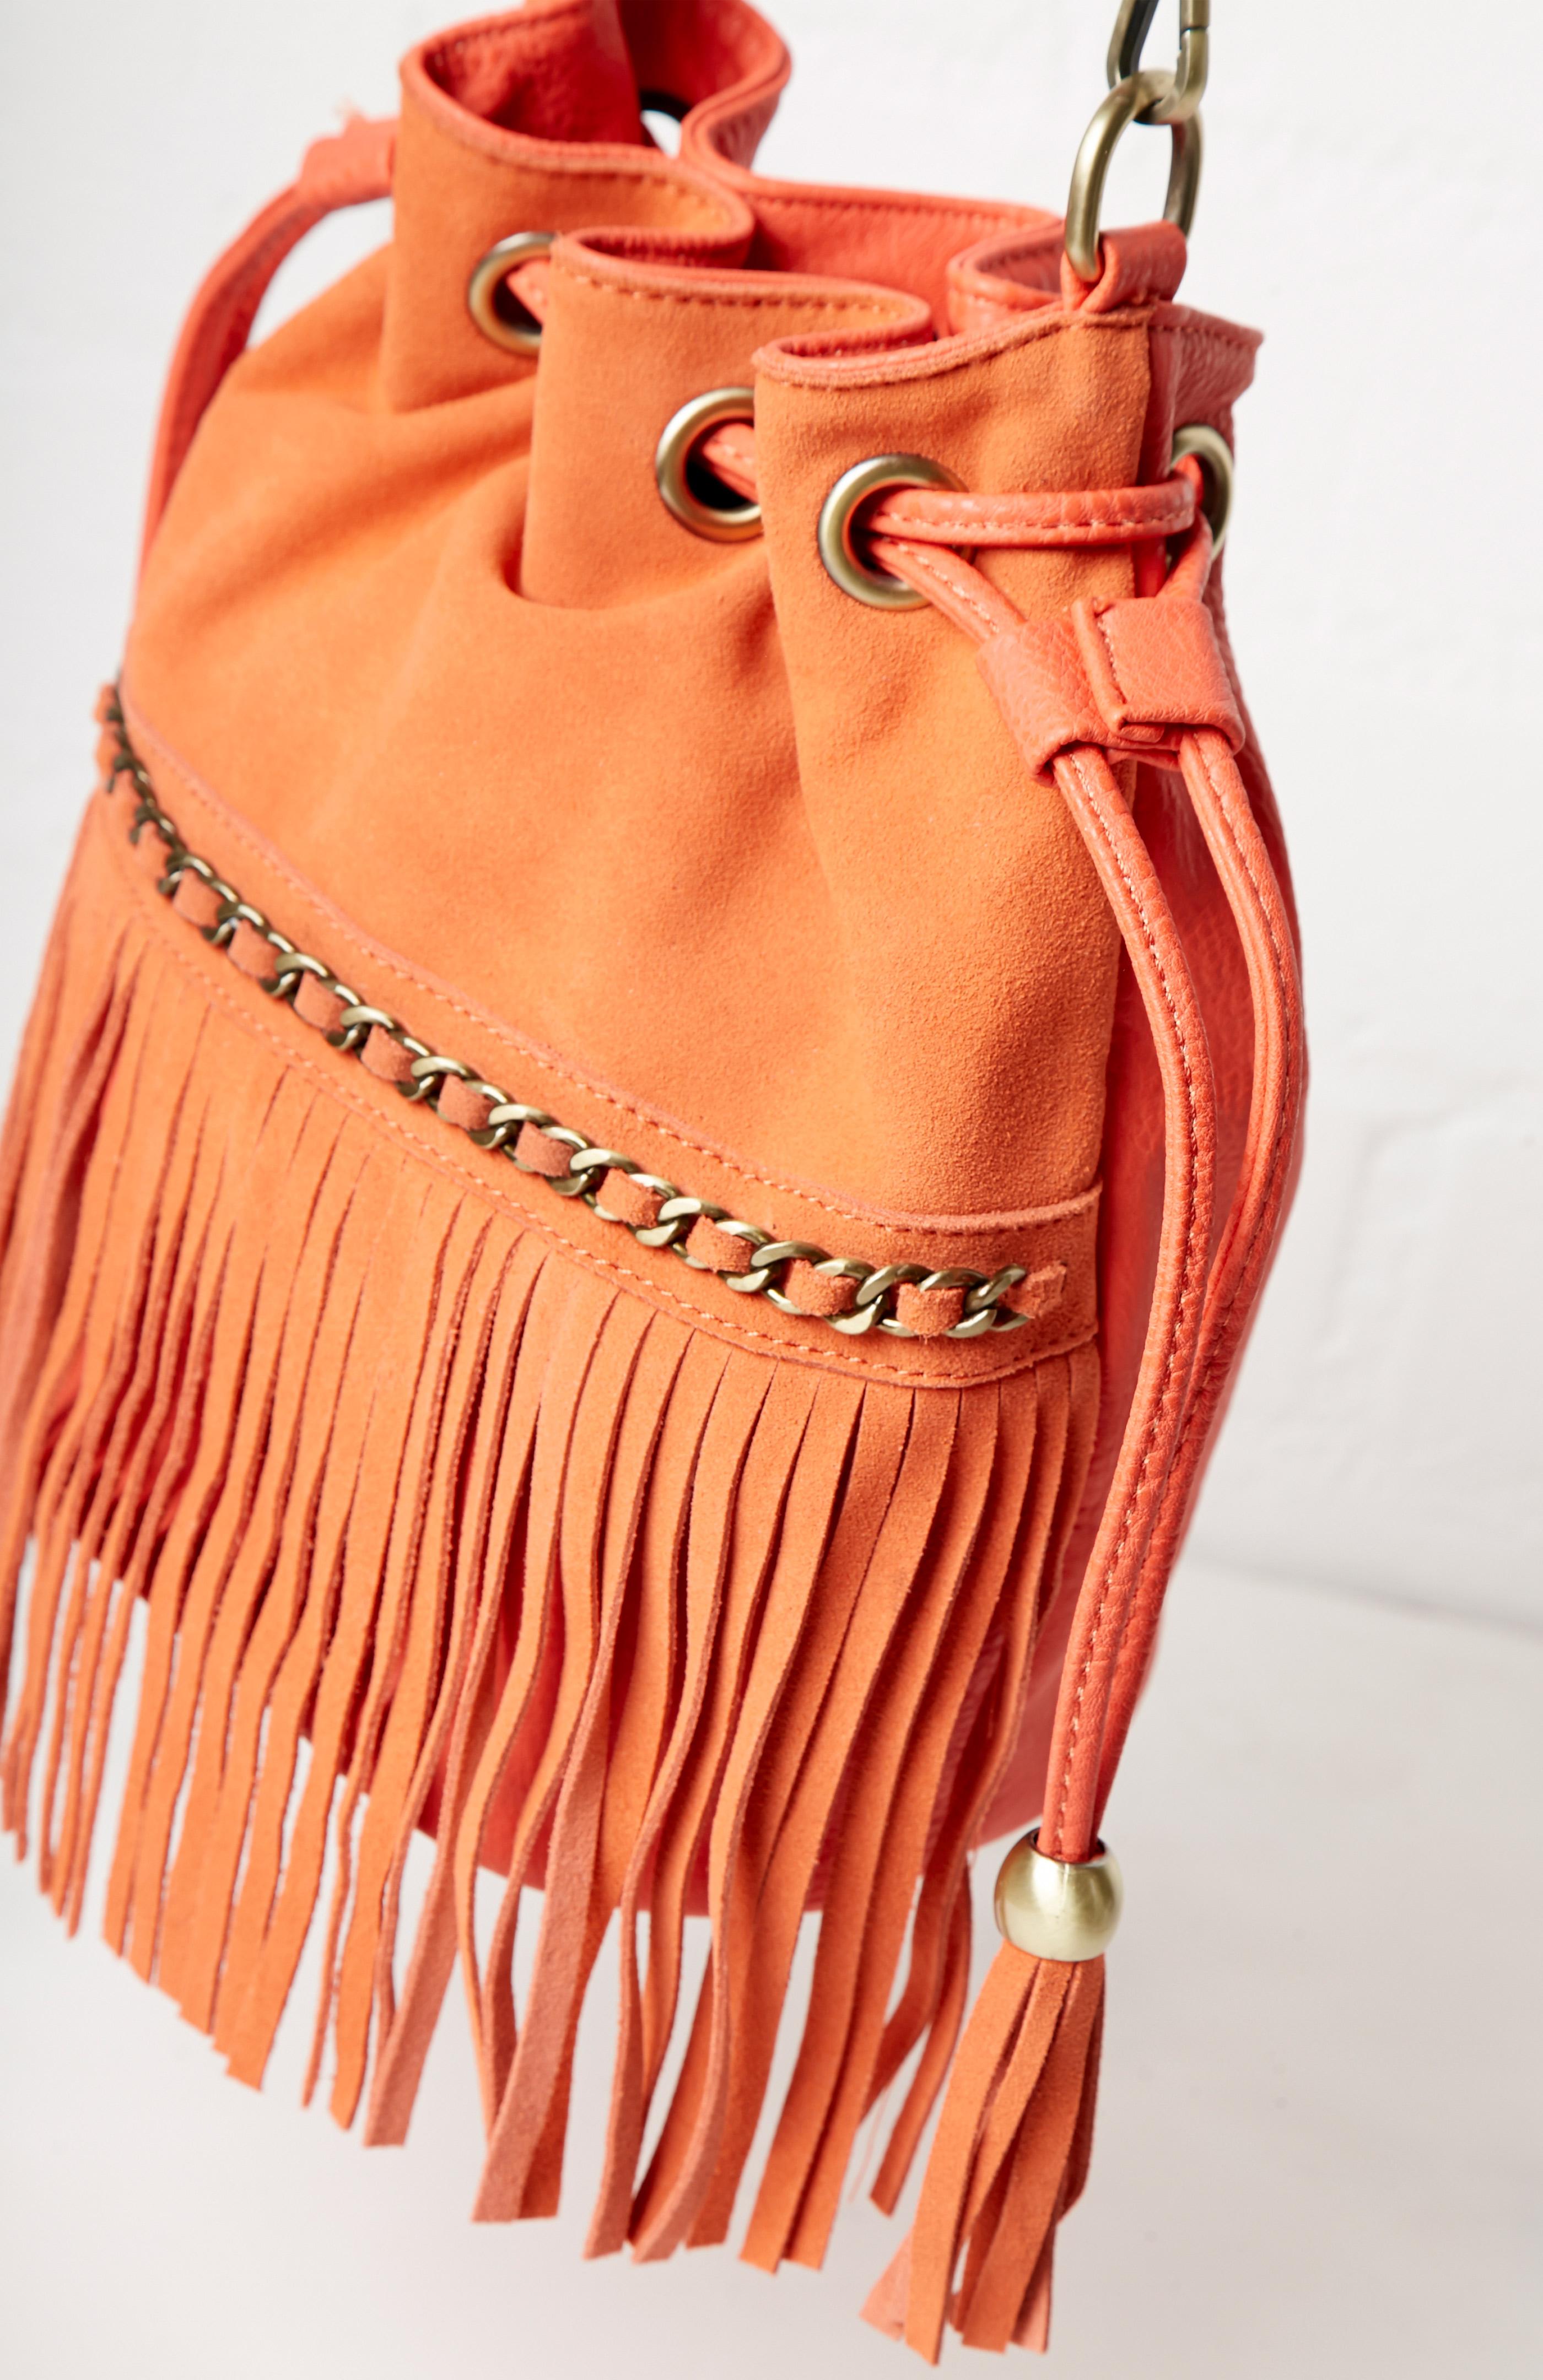 American Rag Faux-Suede Bucket Bag Glazed Ginger